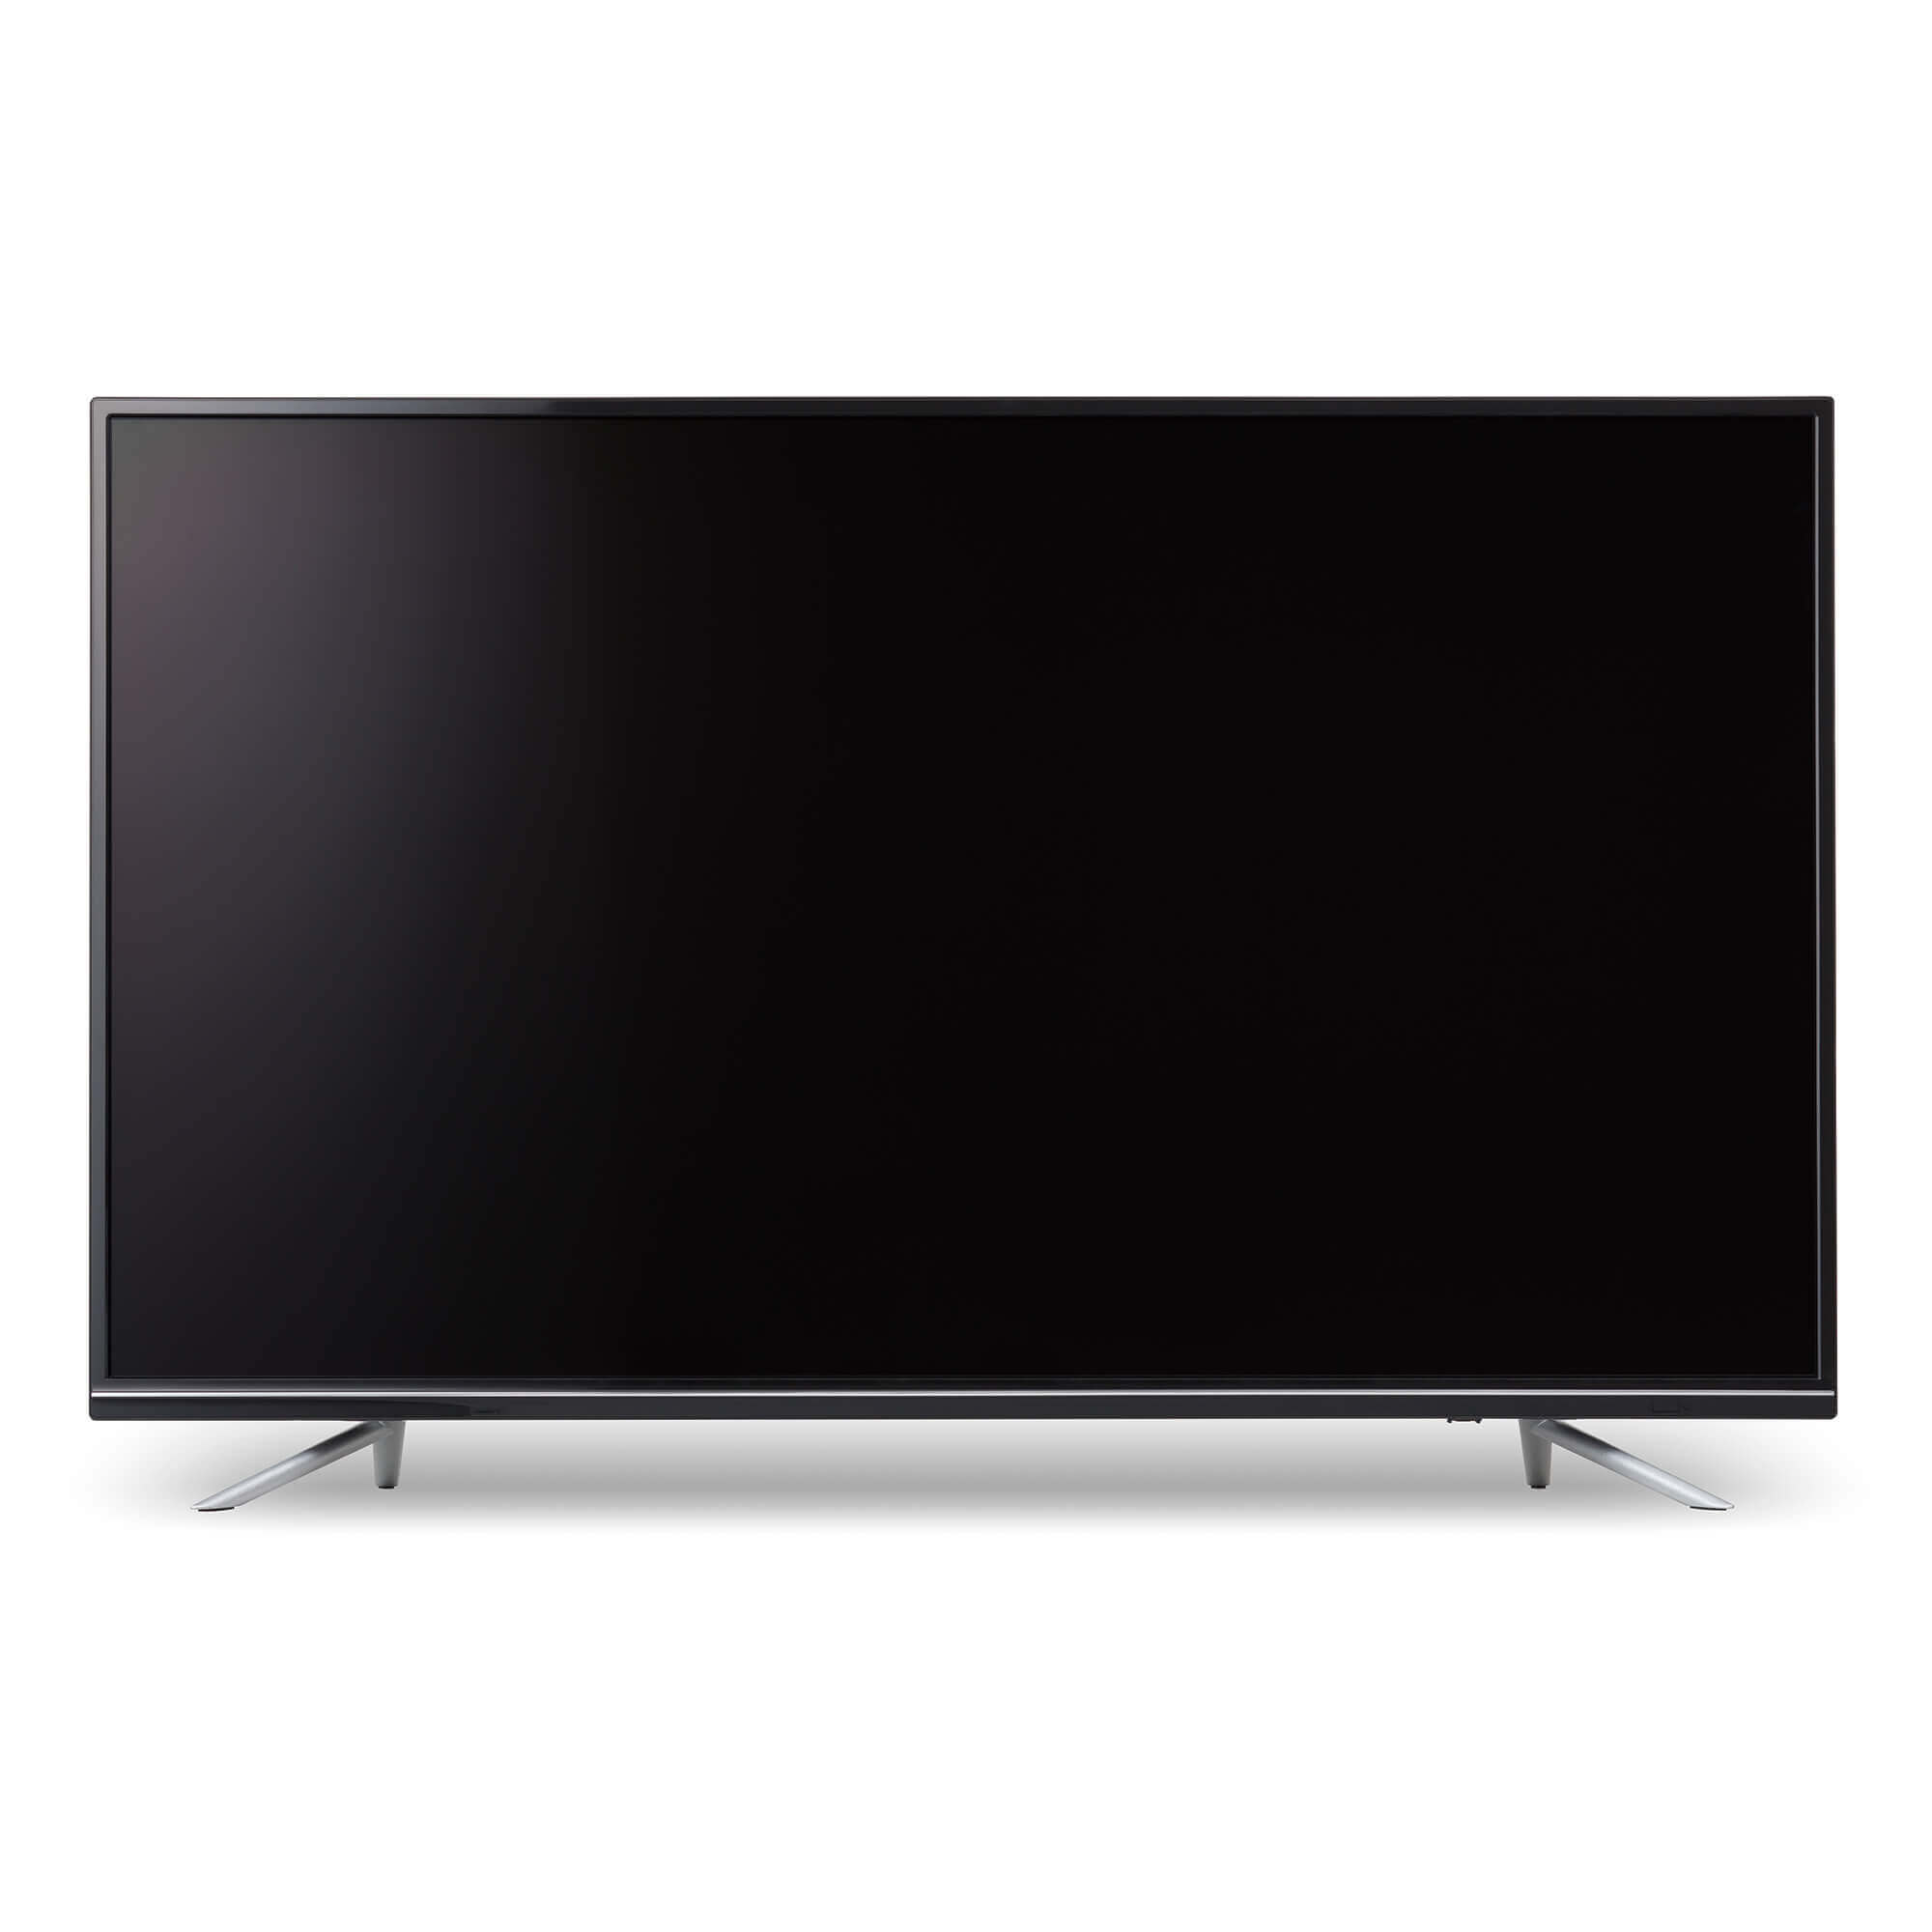 GH-TV49E-BK